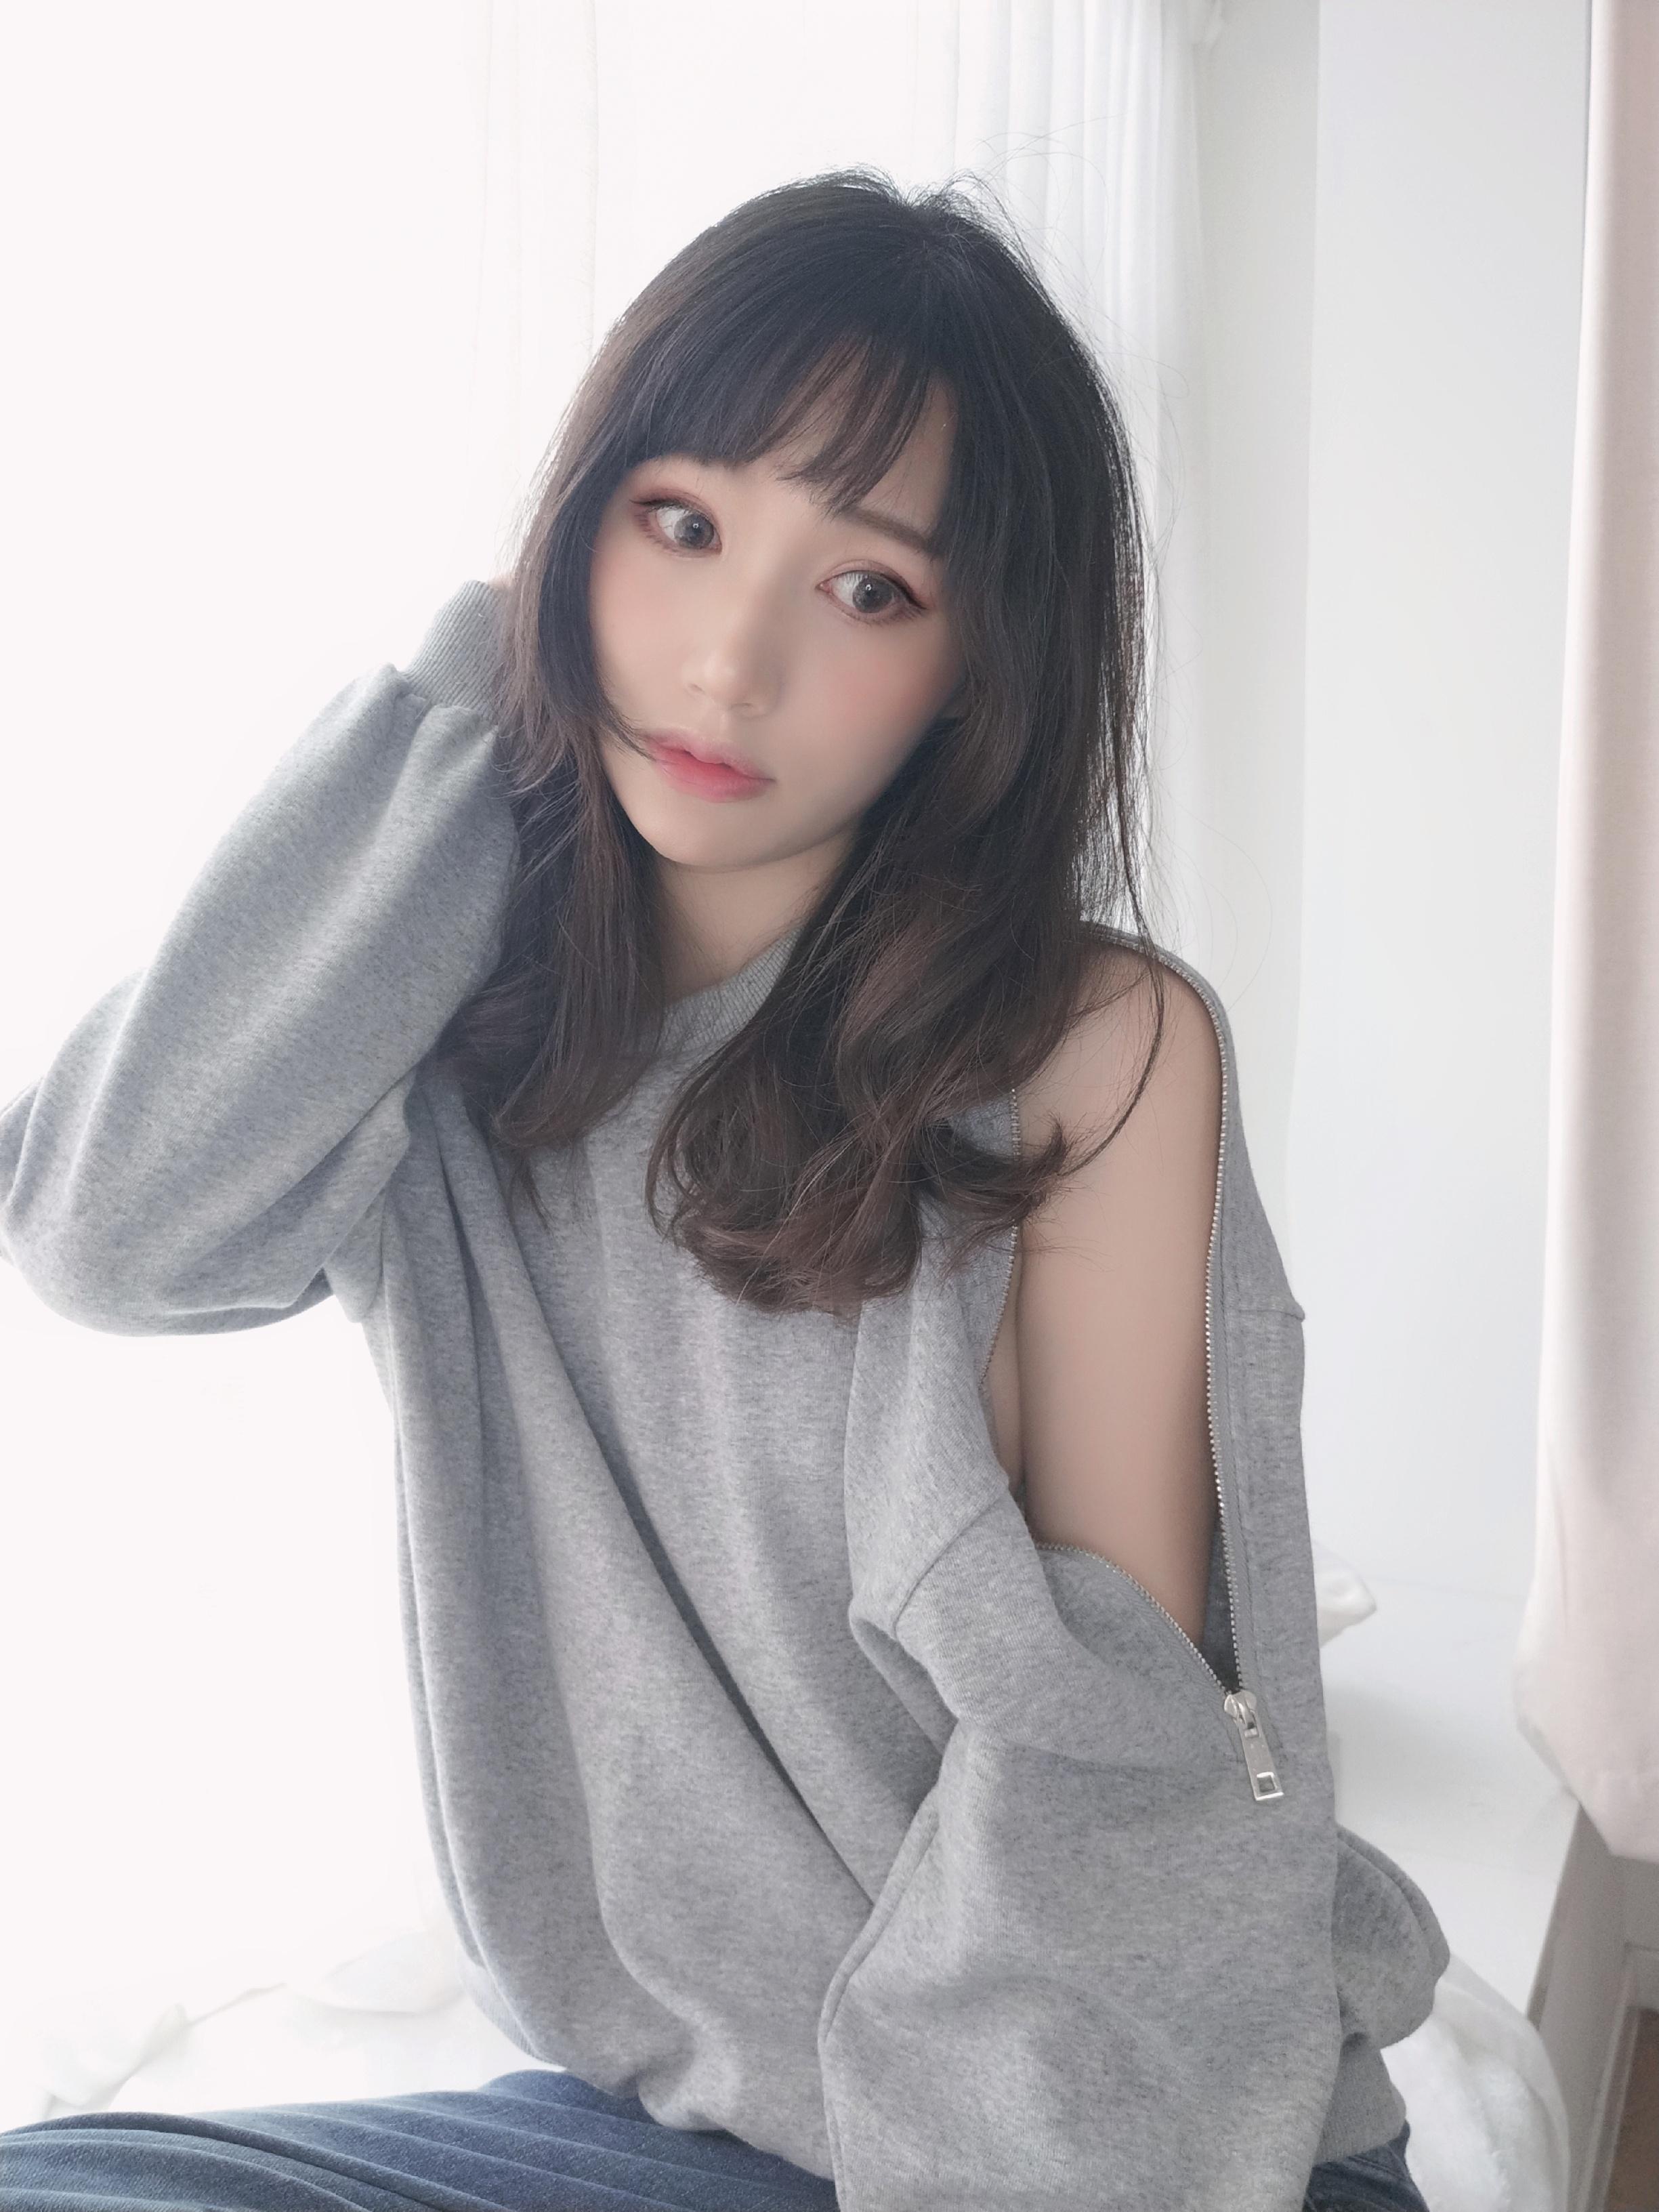 宅男咪zhainanmi.net (11)